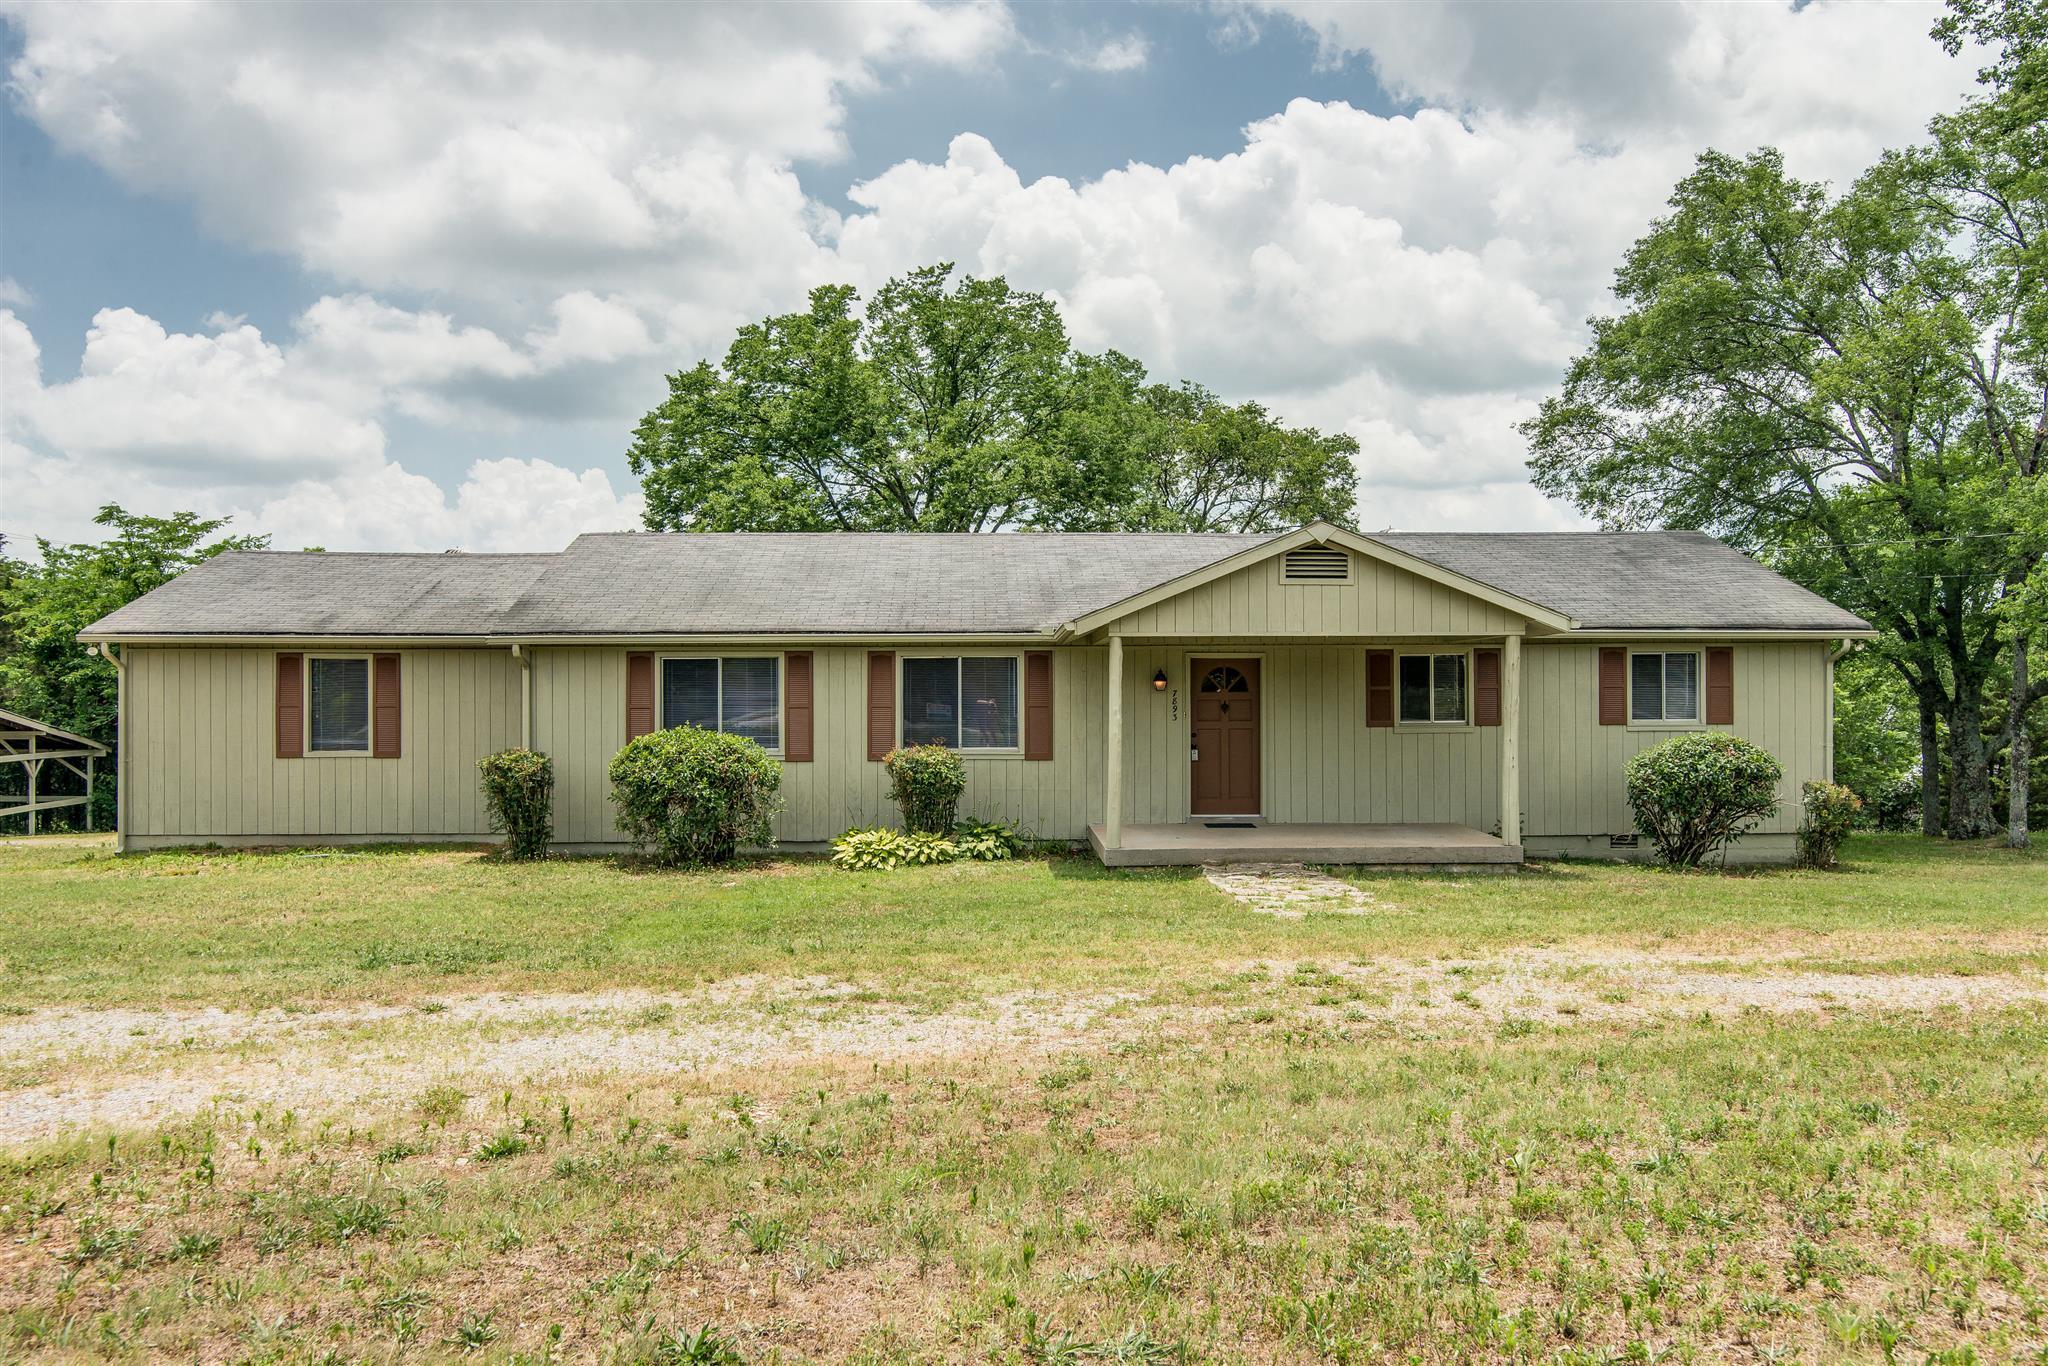 7893 W Buckeye Bottom Rd, Murfreesboro, TN 37129